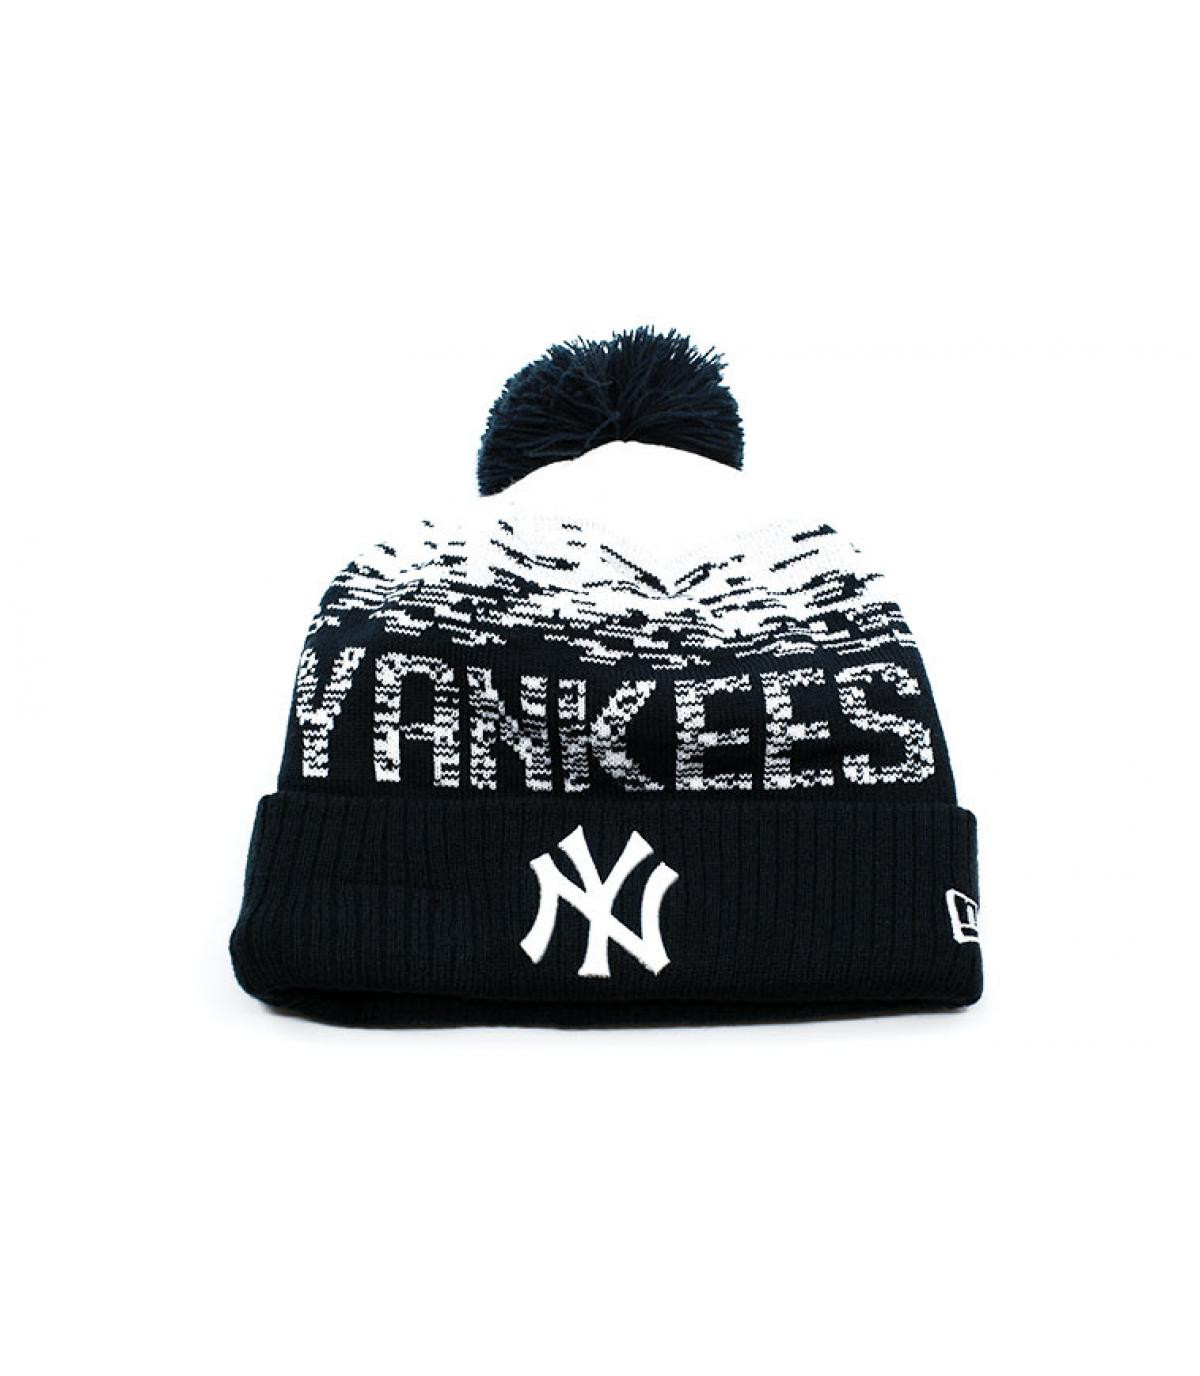 Details MLB Sport Knit NY - afbeeling 2